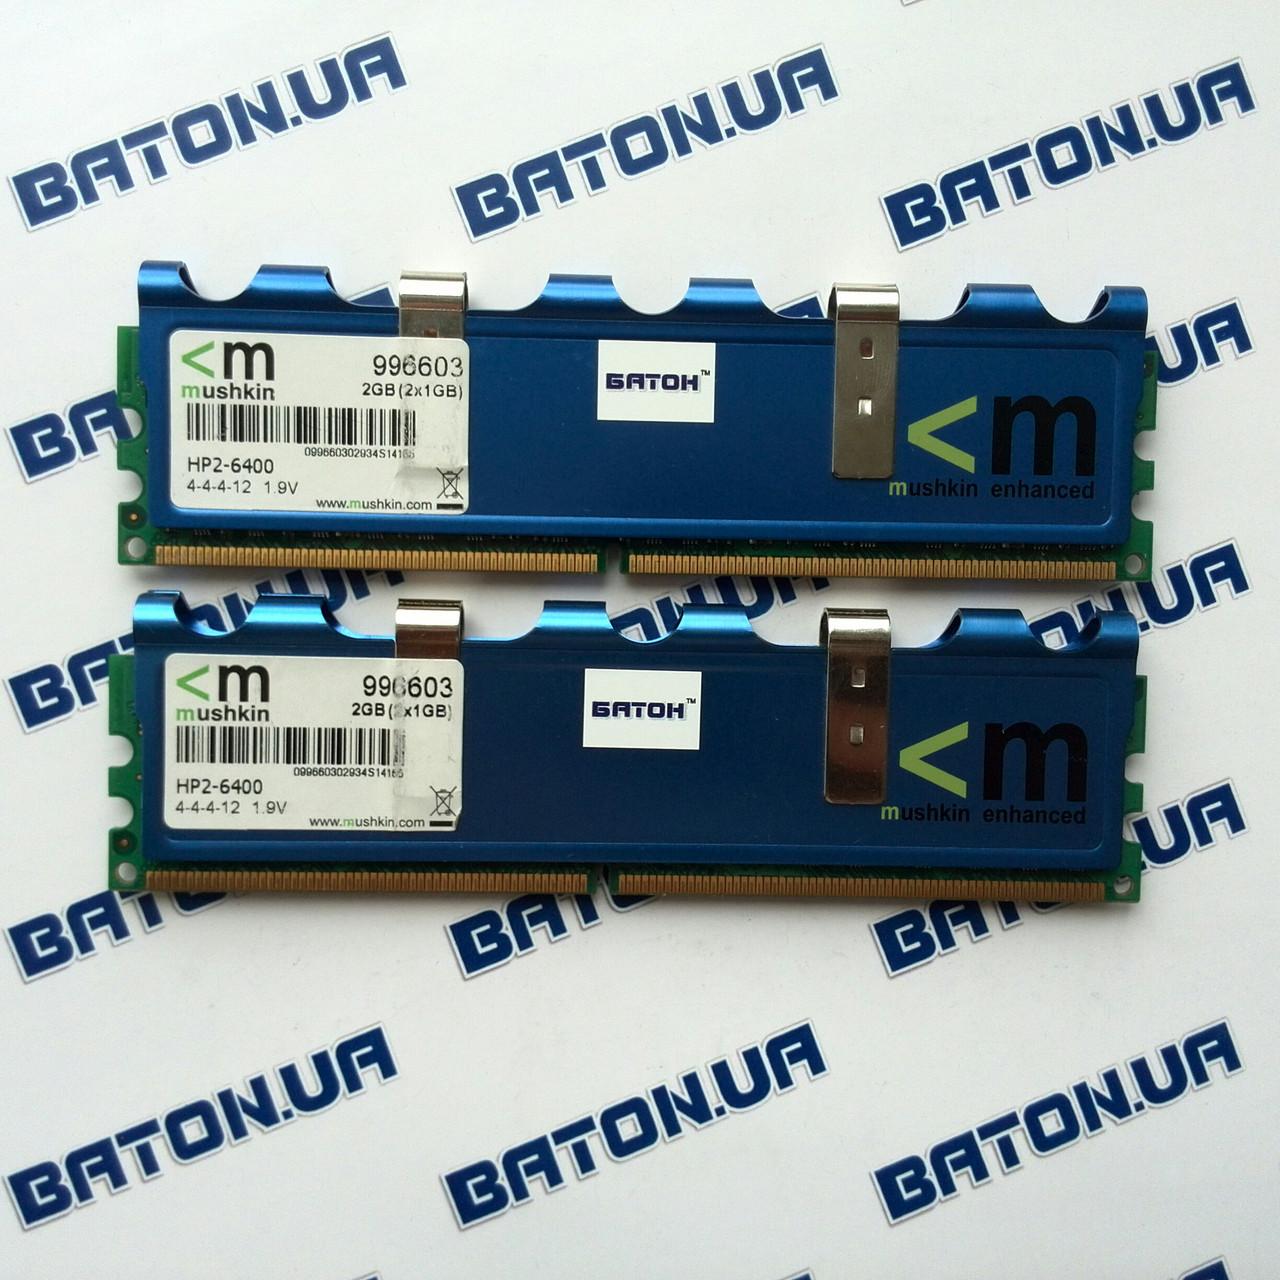 Игровая оперативная память Mushkin DDR2 1Gb+1Gb 800MHz PC2 6400U CL4, Оригинал, для Intel/AMD, Гарантия